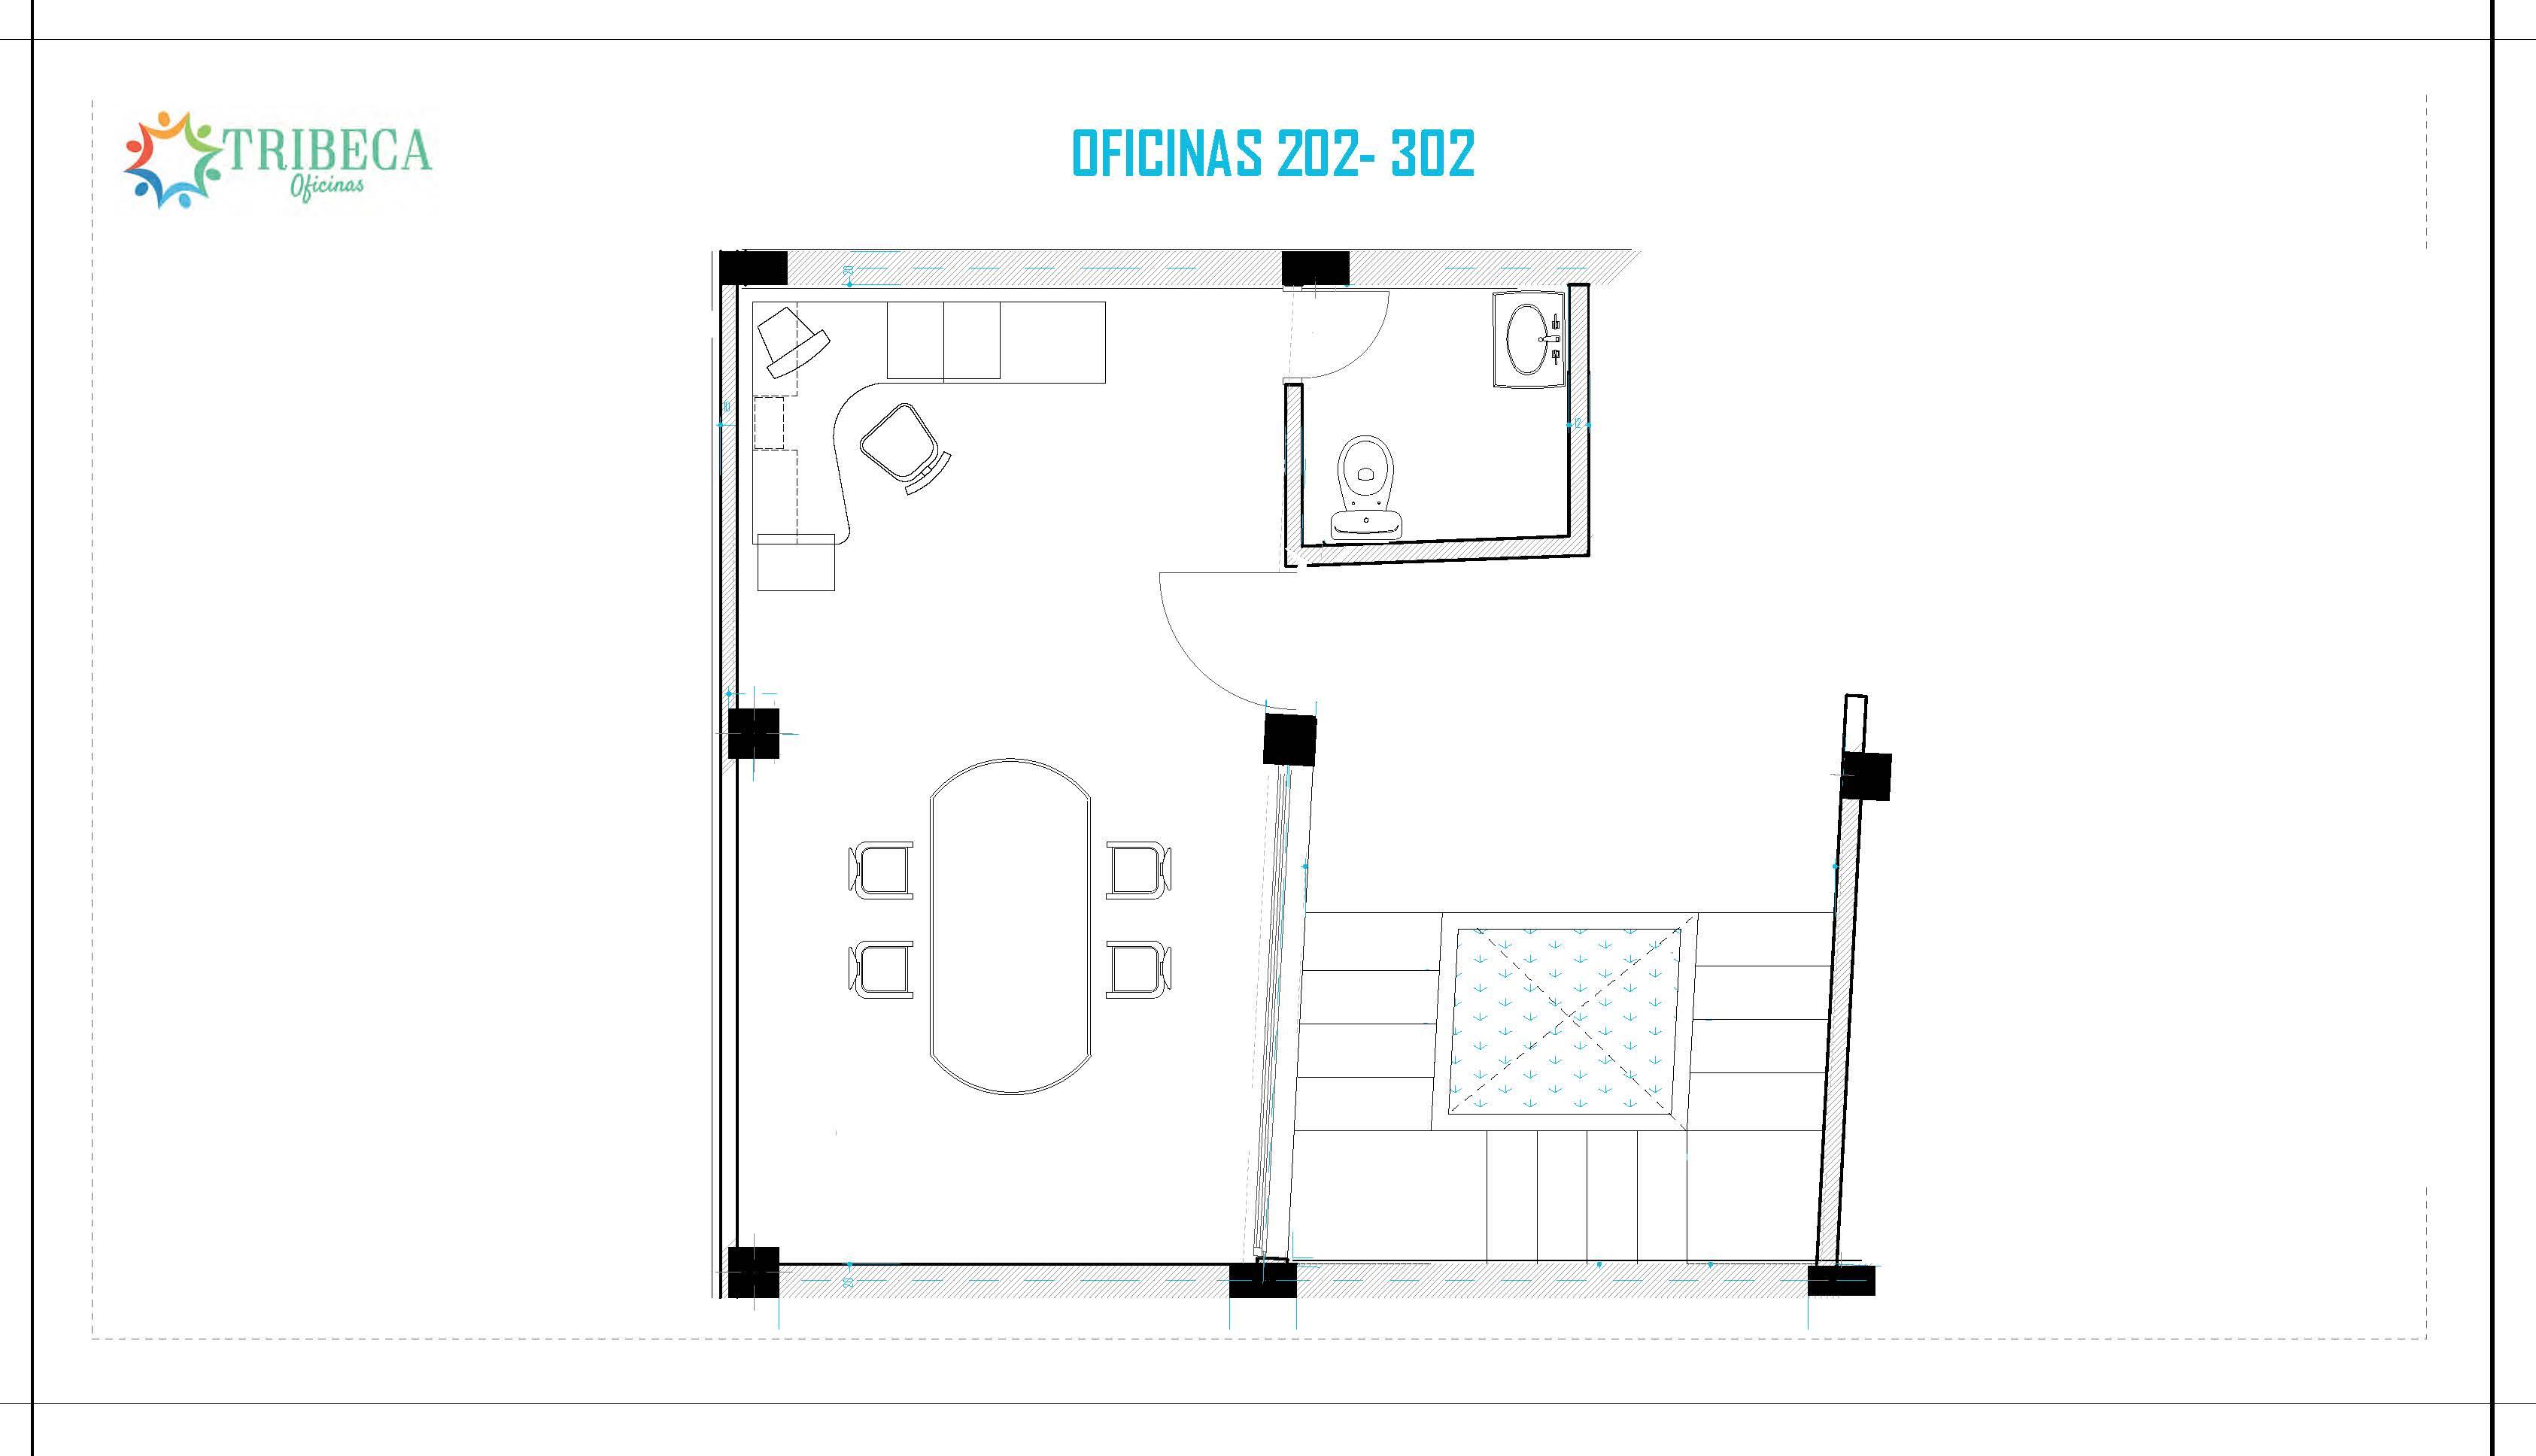 https://0201.nccdn.net/1_2/000/000/127/678/plano-oficinas-con-mesas-y-sillas-202-302-3371x1936.jpg